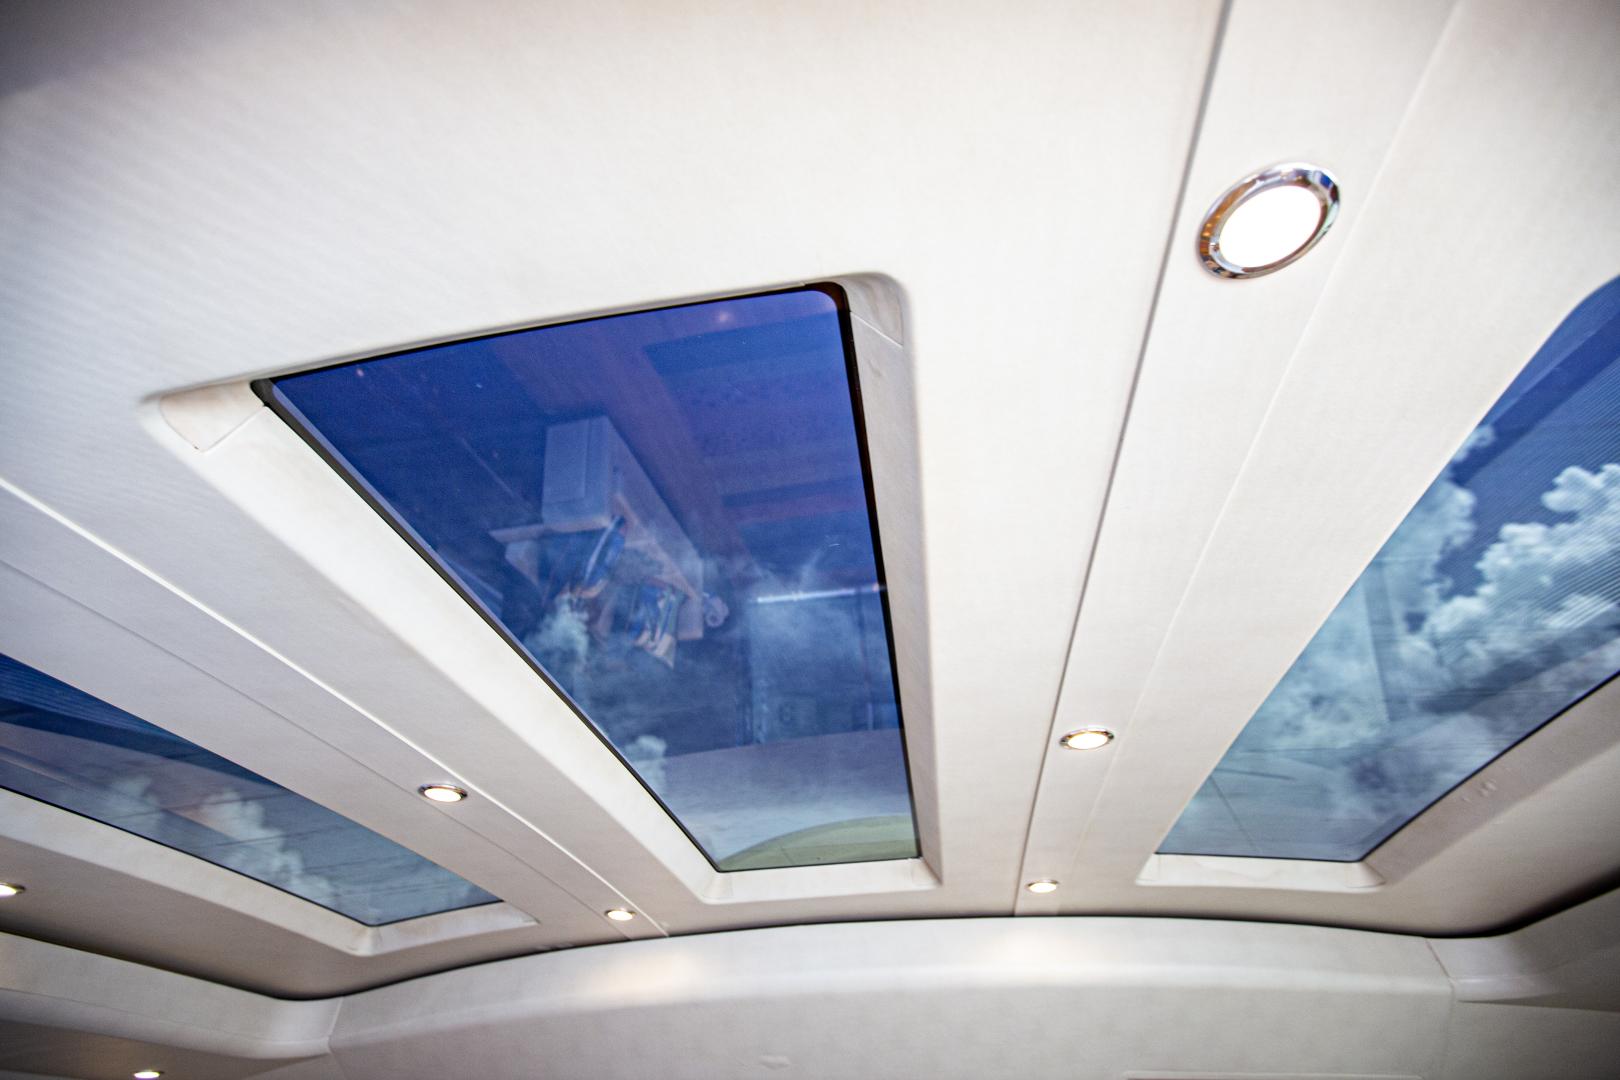 Viking Princess-V85 2009-Las Brisas Fort Lauderdale-Florida-United States-1365516 | Thumbnail